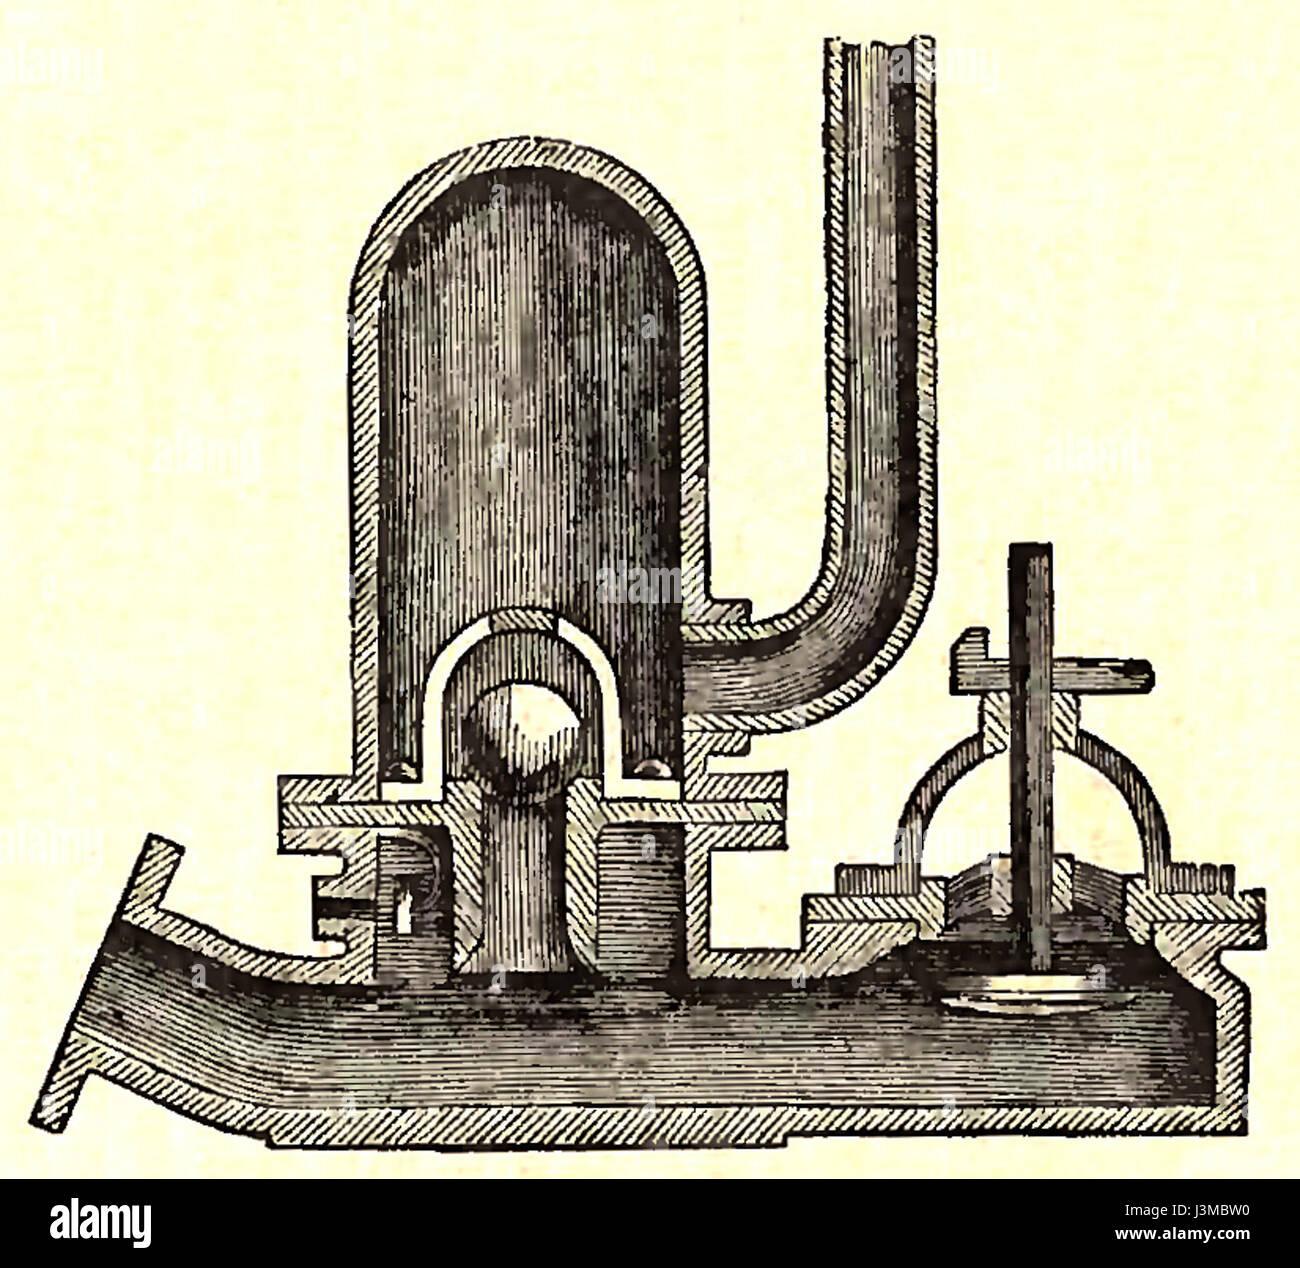 Hydraulic Ram Stock Photos Images Alamy Diagram Easton And Amos 1851 Image